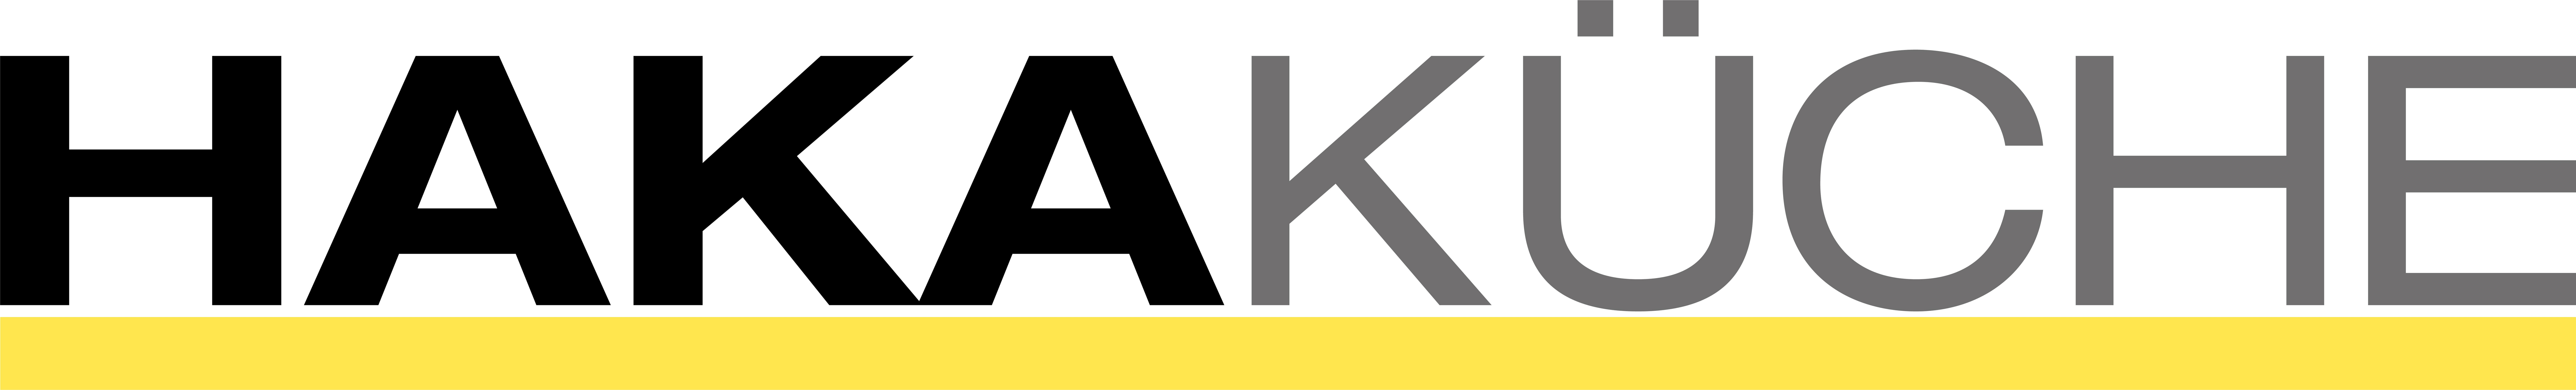 File Haka Kuche Jpg Wikimedia Commons